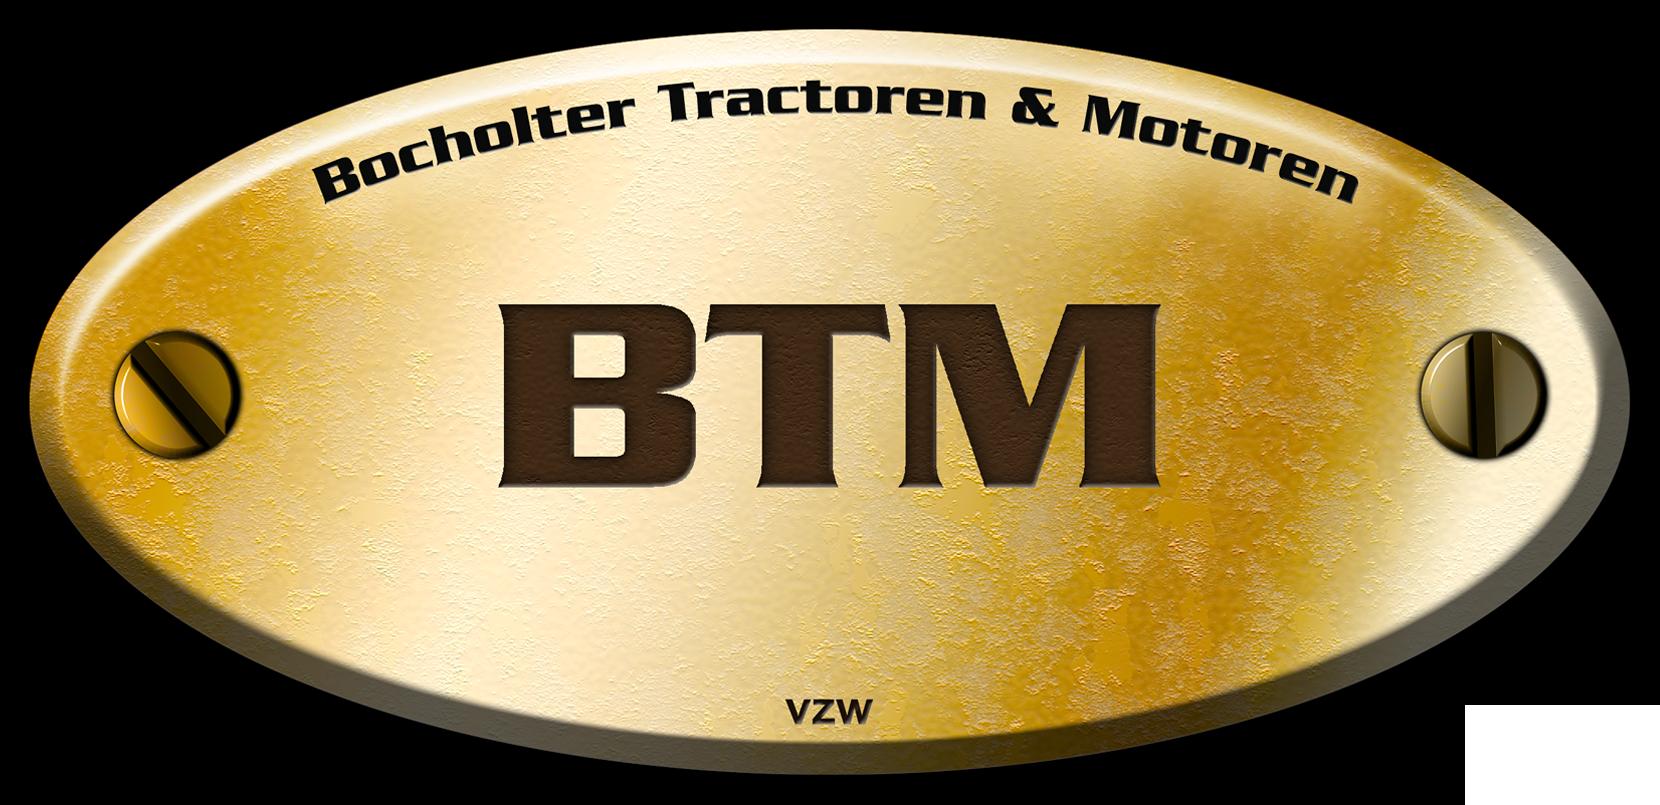 Bocholter Tractoren & Motoren